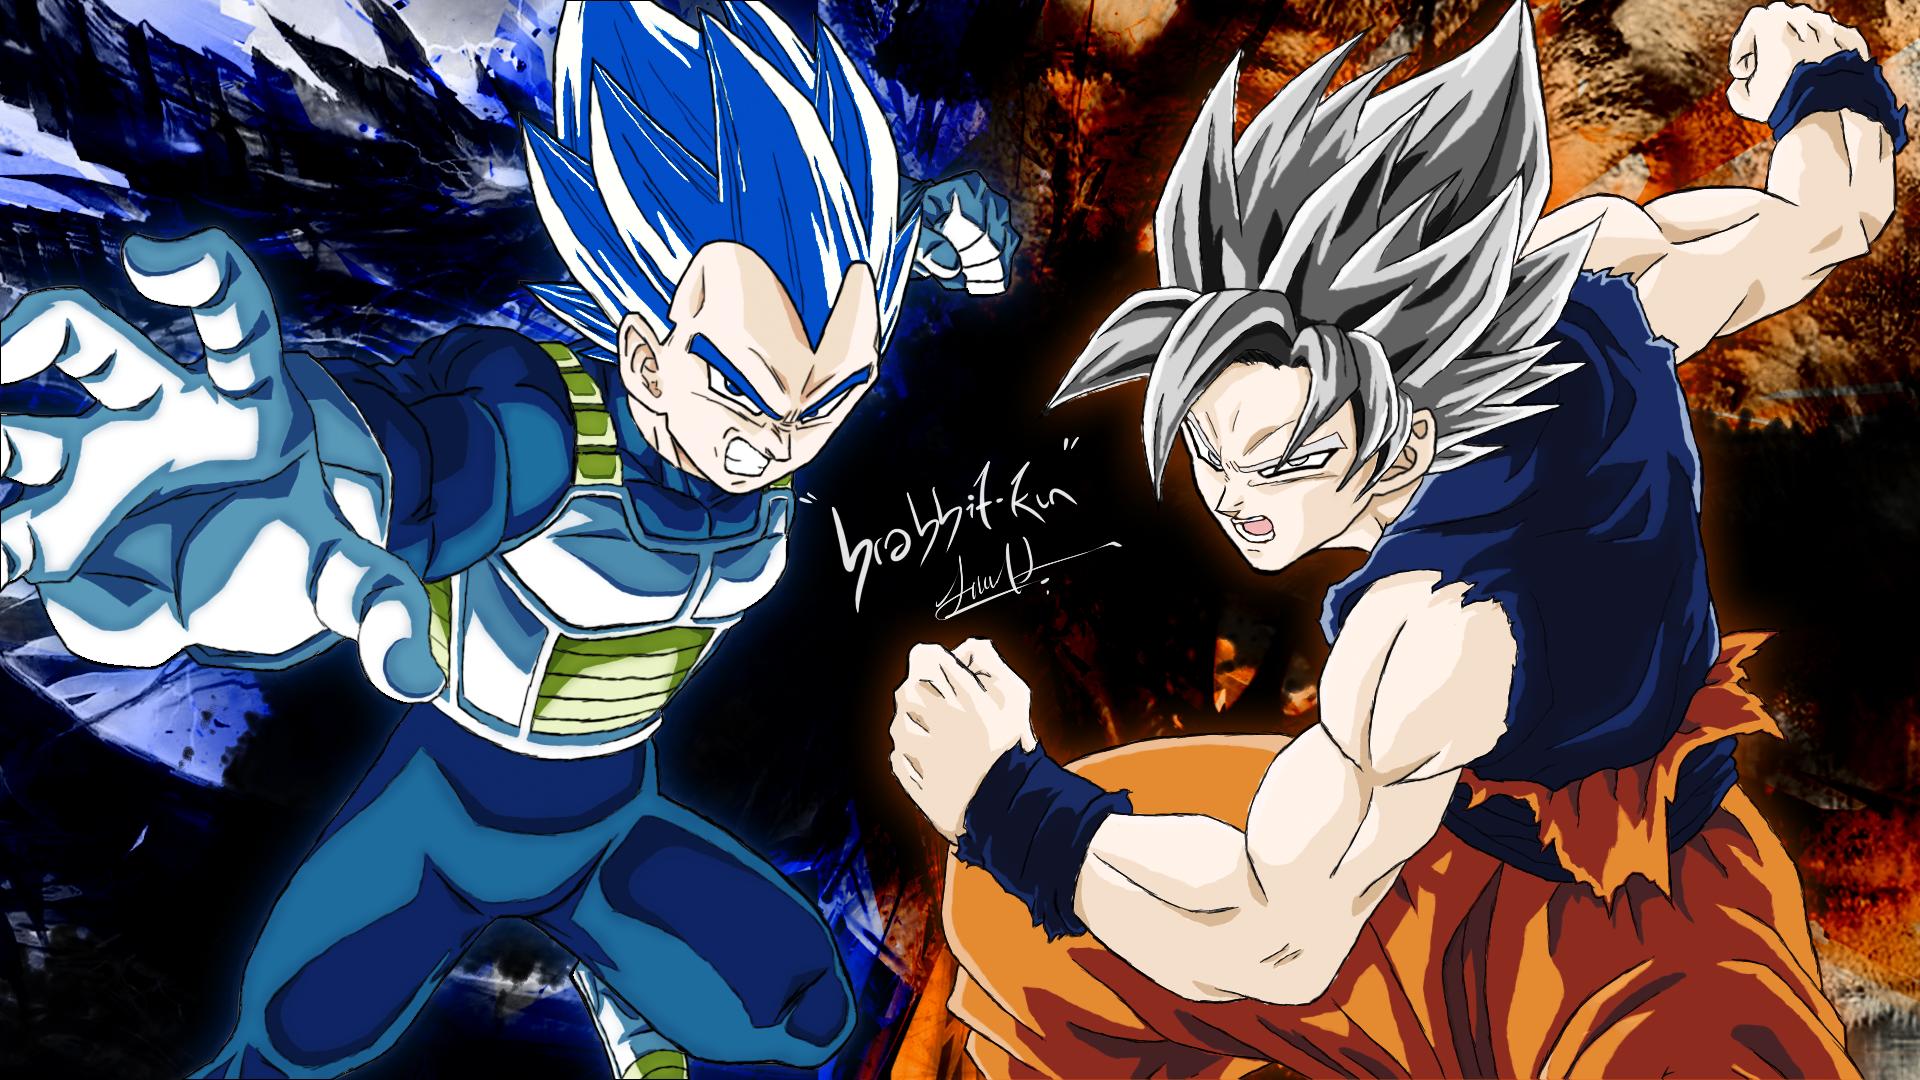 Wallpaper Son Goku Vegeta Ultra Instict Dragon Ball